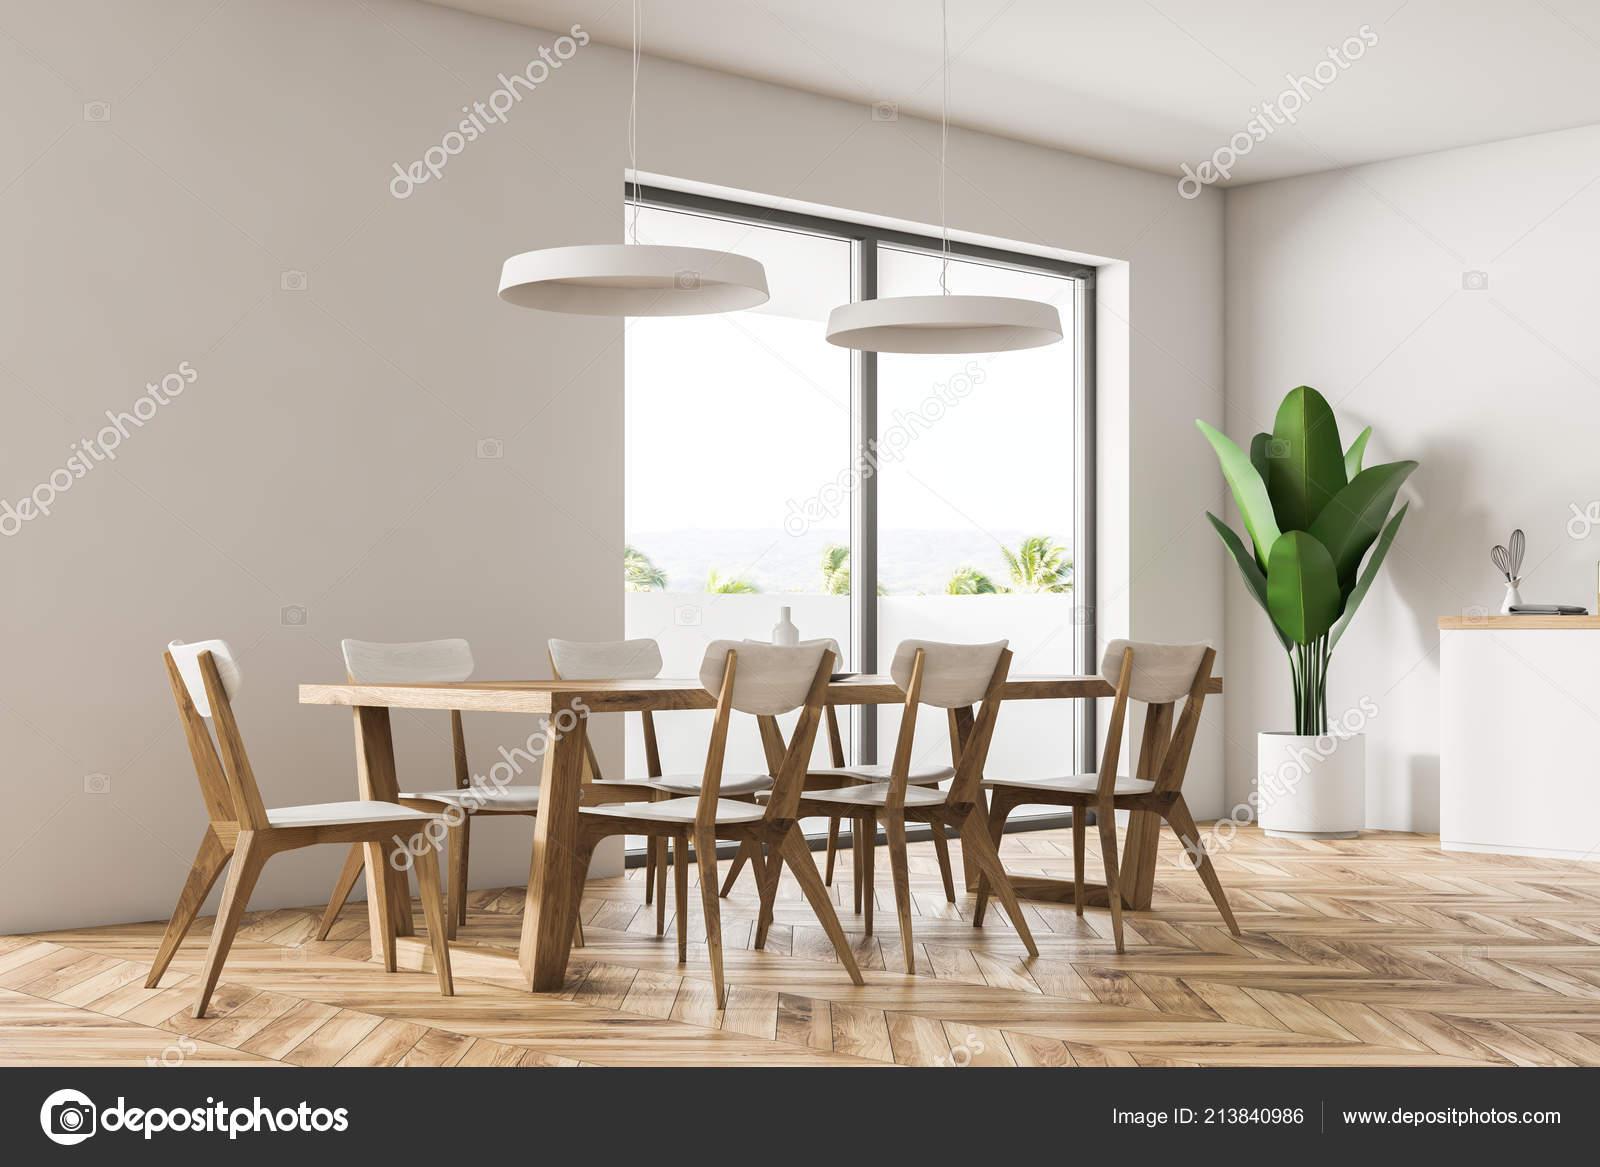 Coin Salle Manger Moderne Avec Des Murs Blancs Plancher Bois ...